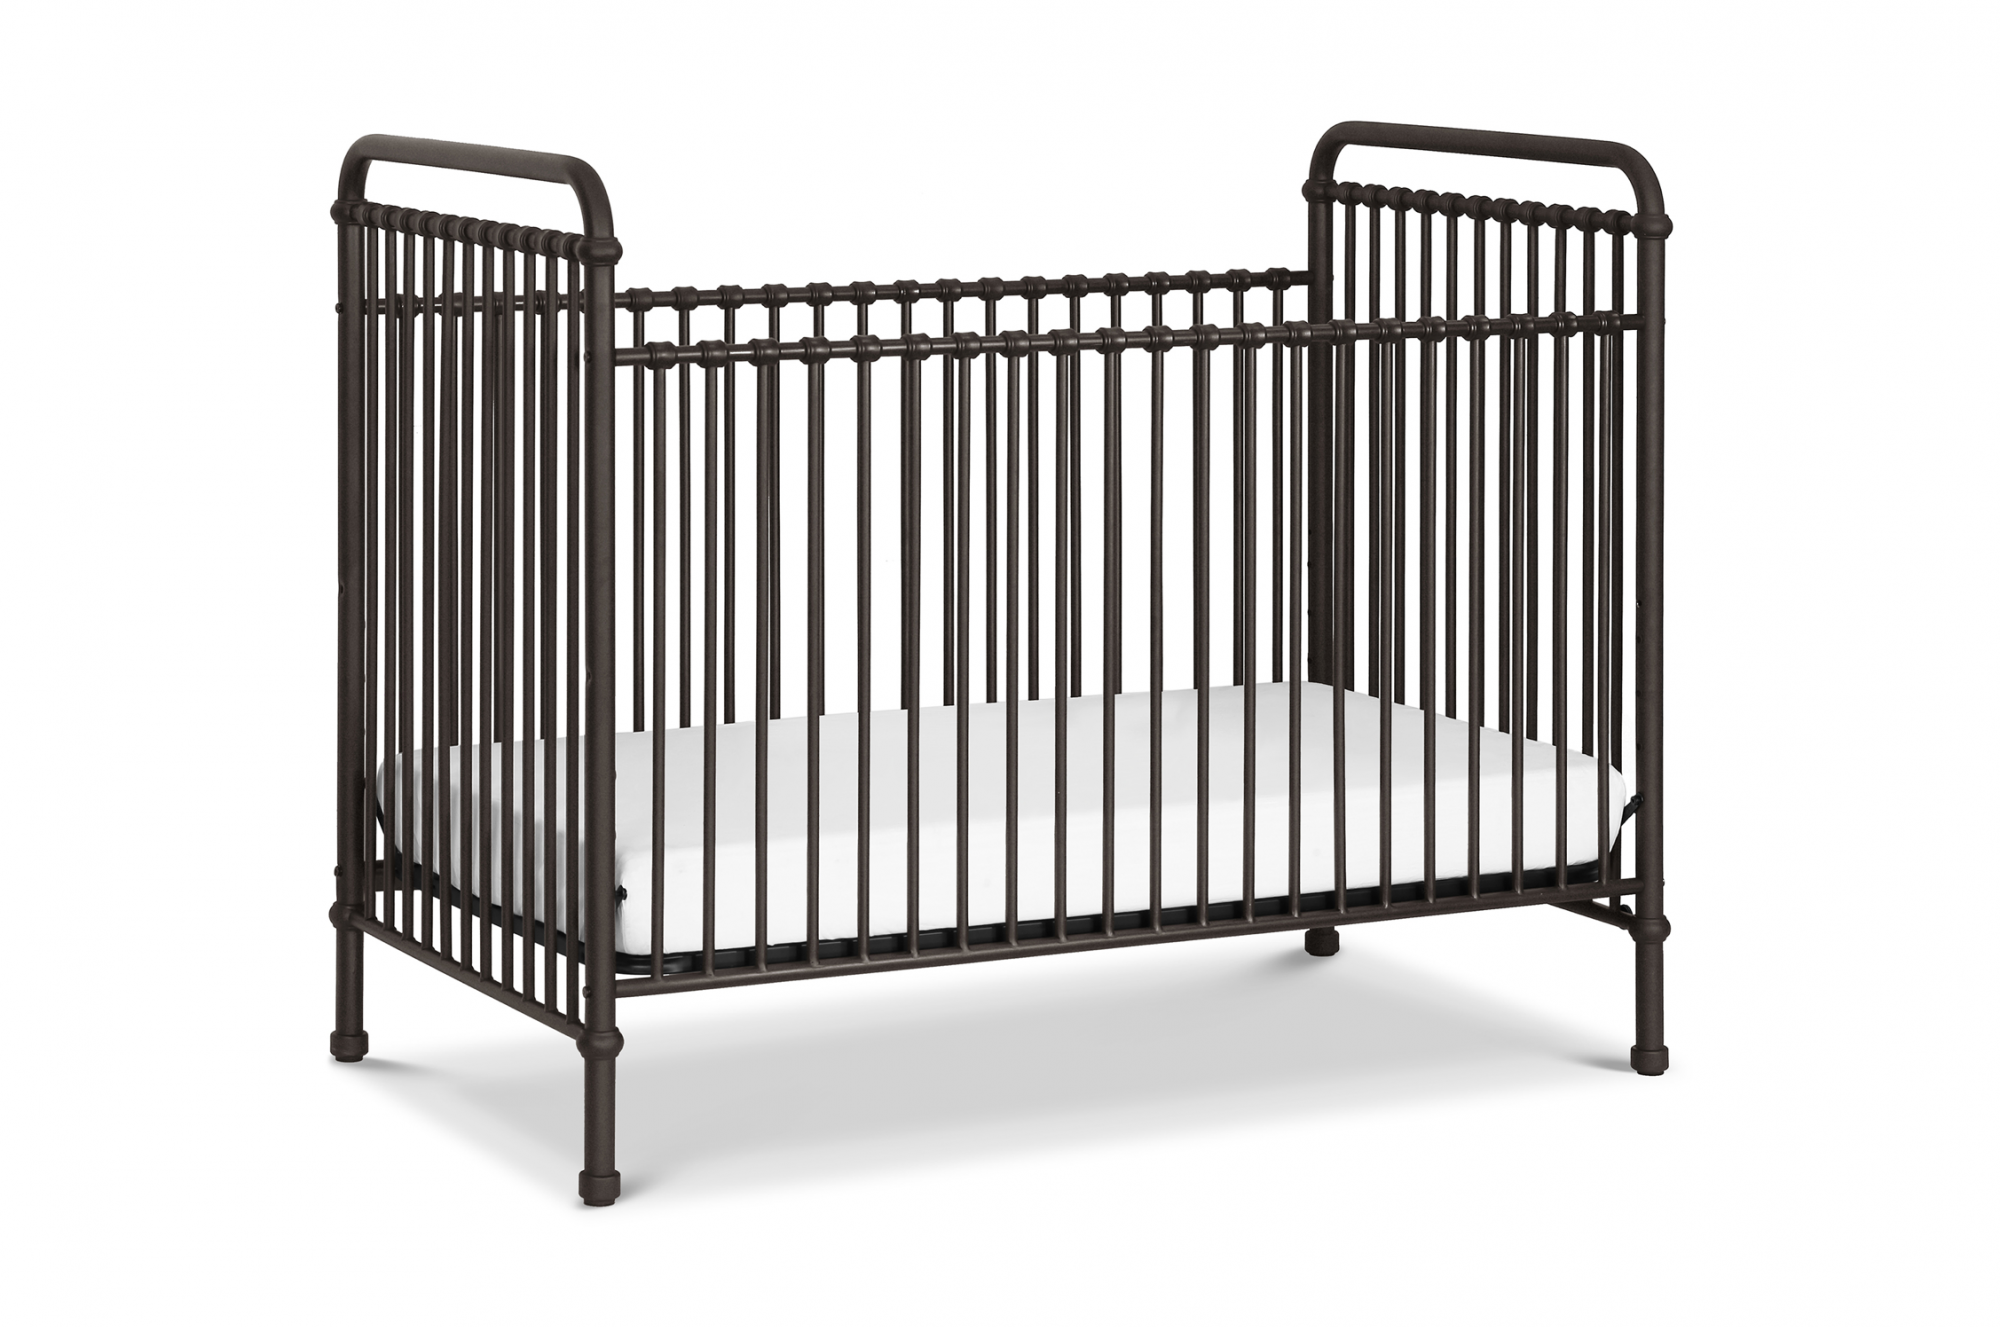 Million Dollar Baby | Abigail | 3-IN-1 Convertible Crib